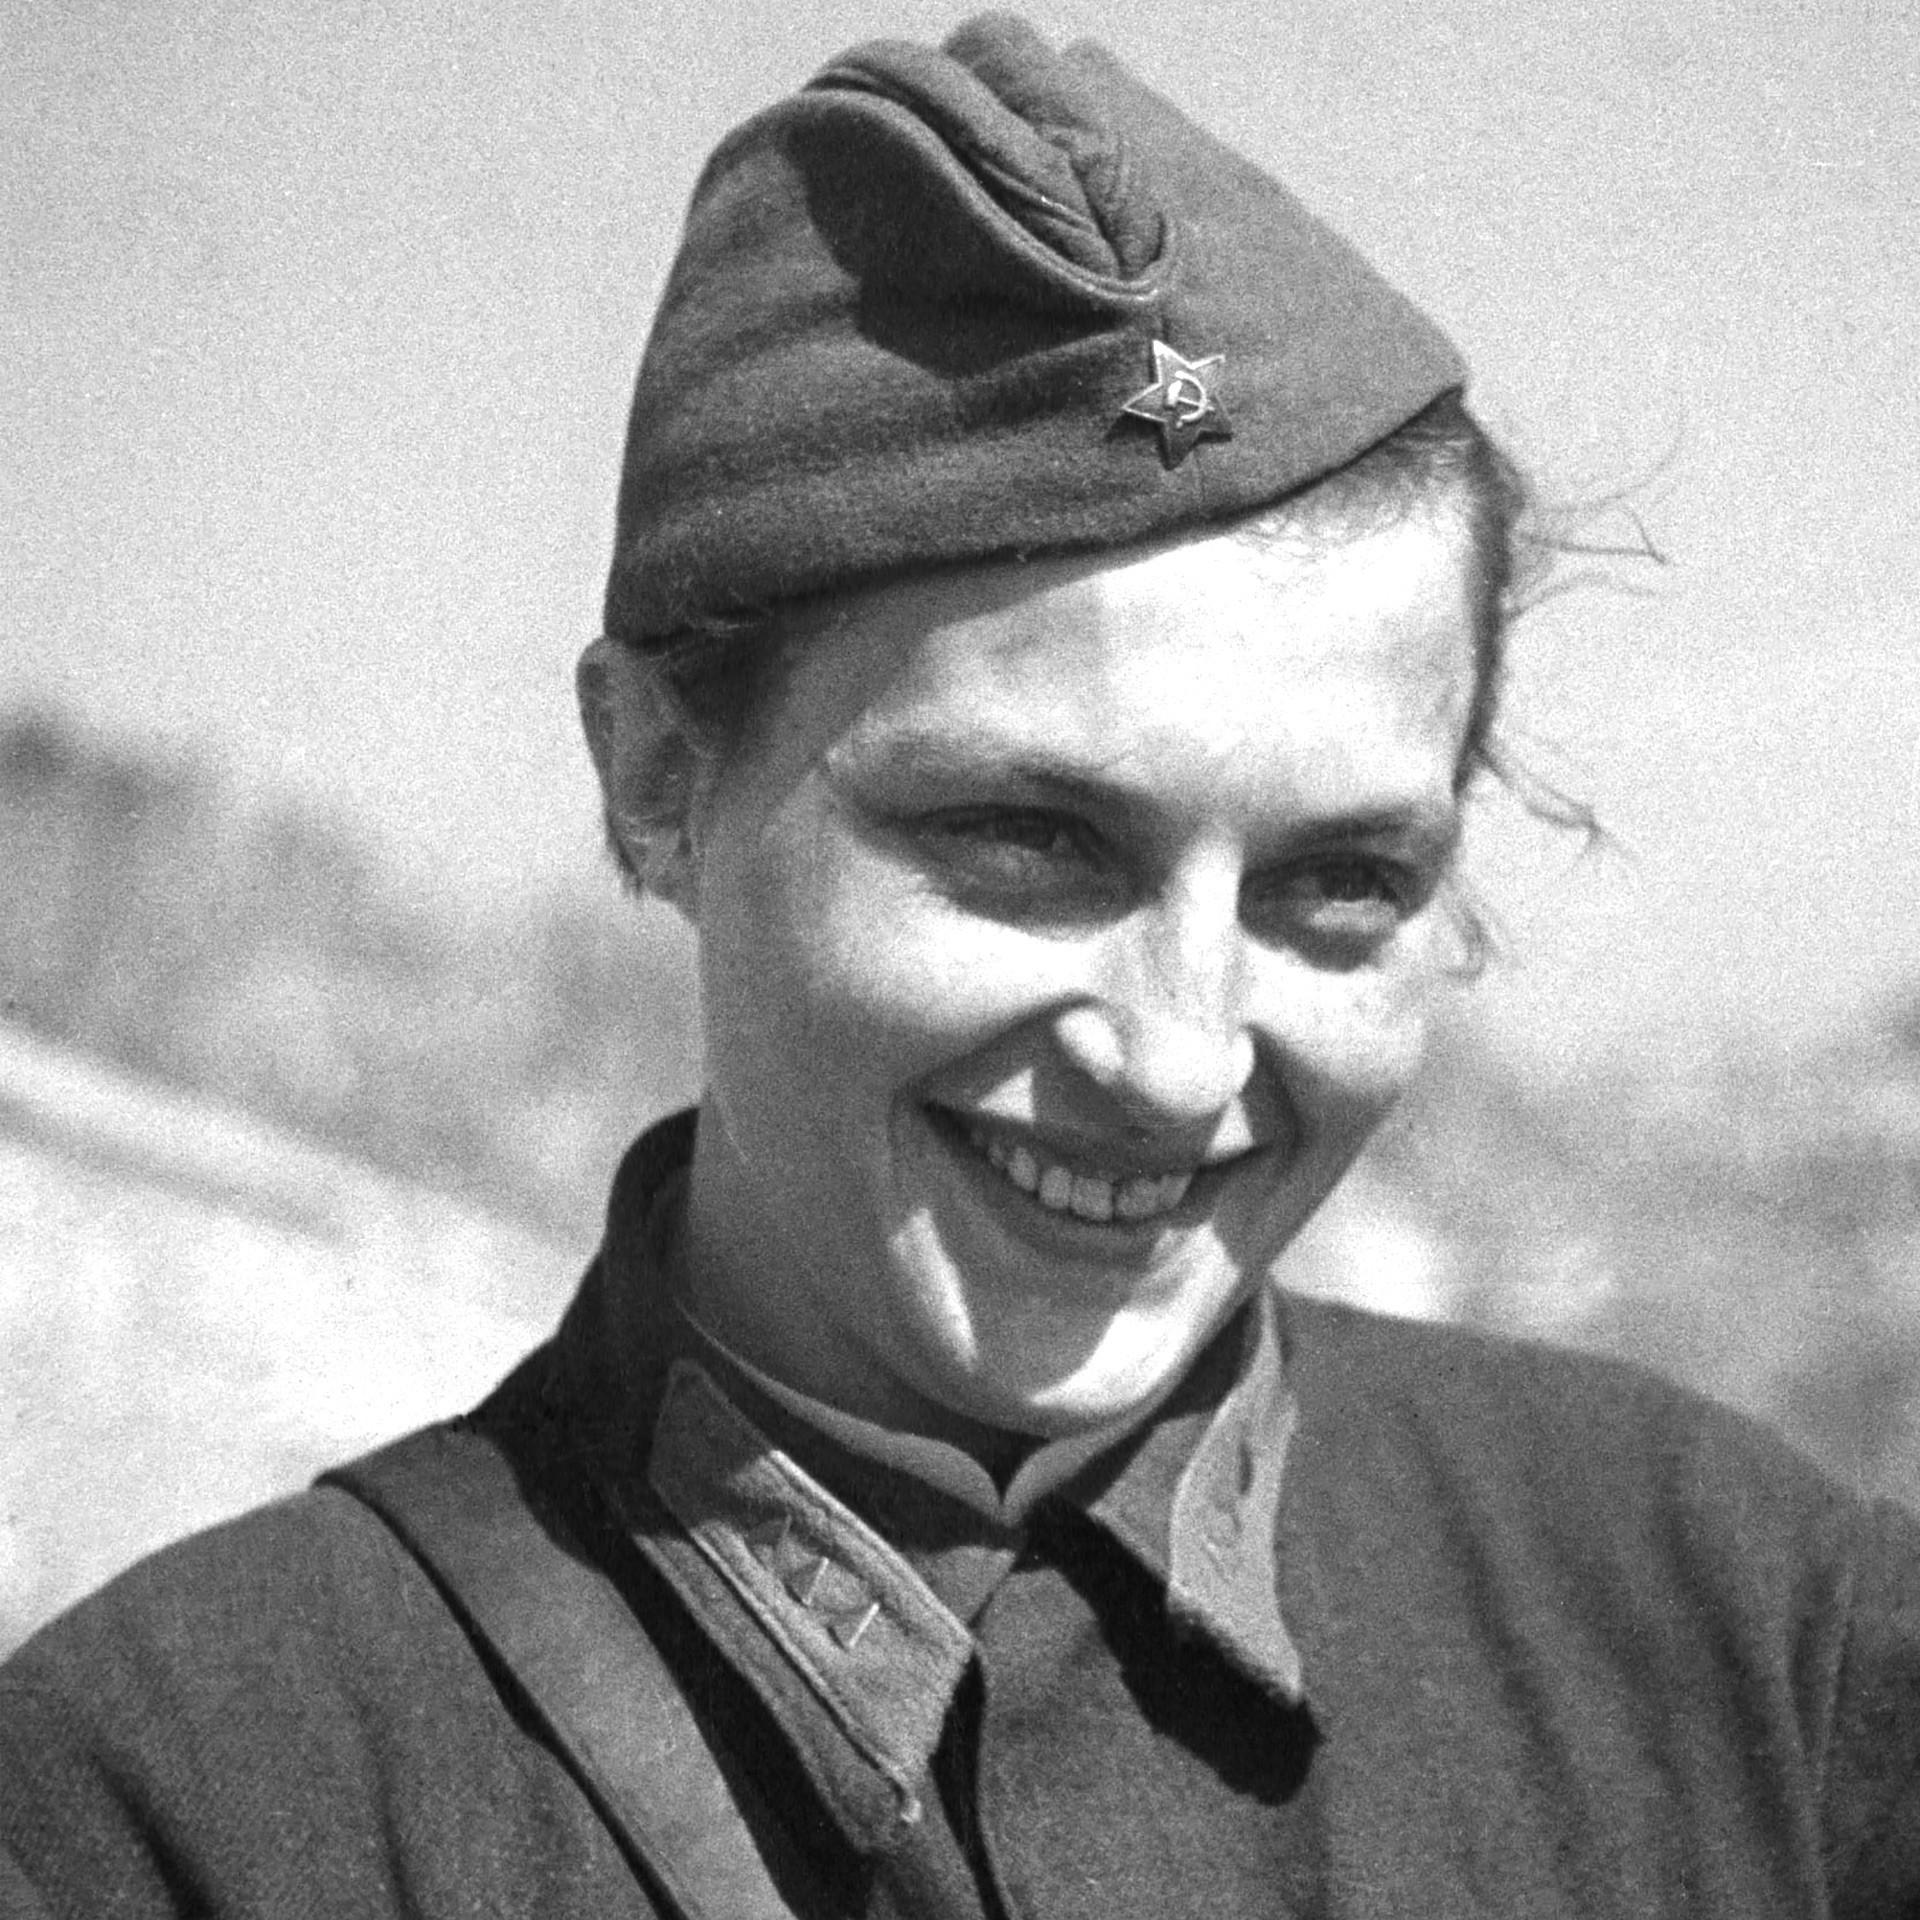 Liudmila Pavlitchenko